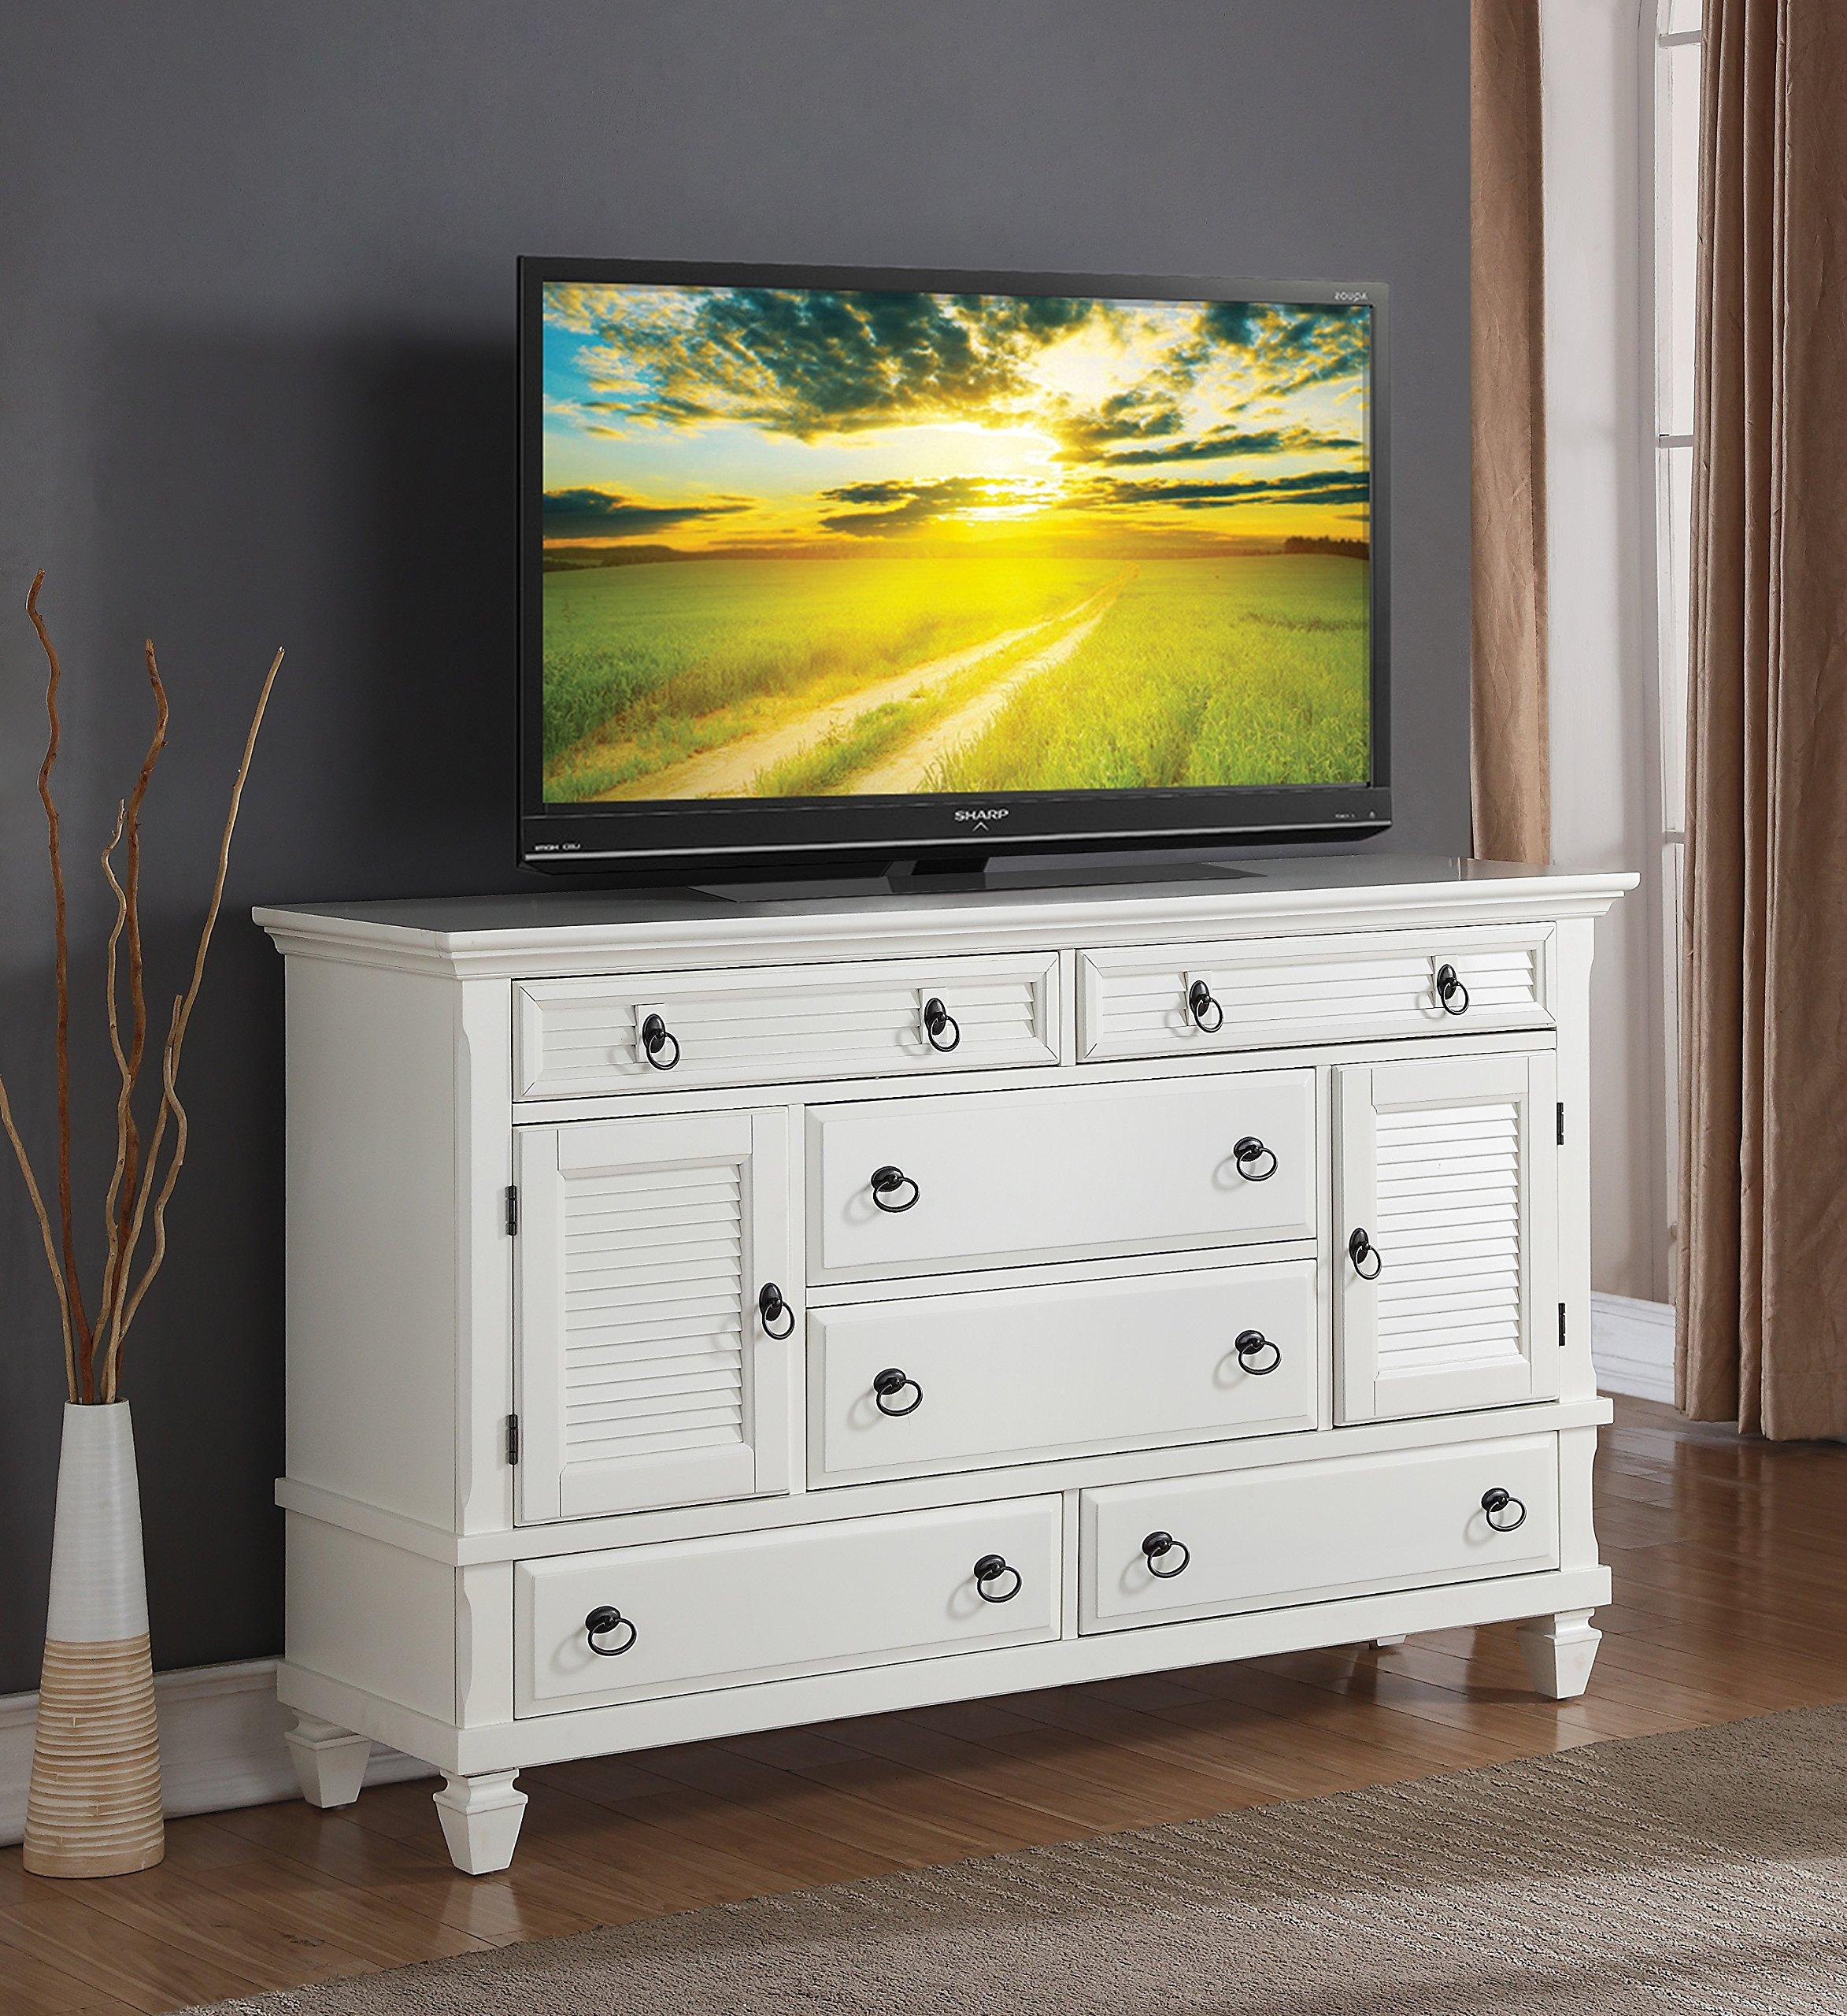 Roundhill Furniture Regitina 016 Bedroom Dresser, Queen/King, White